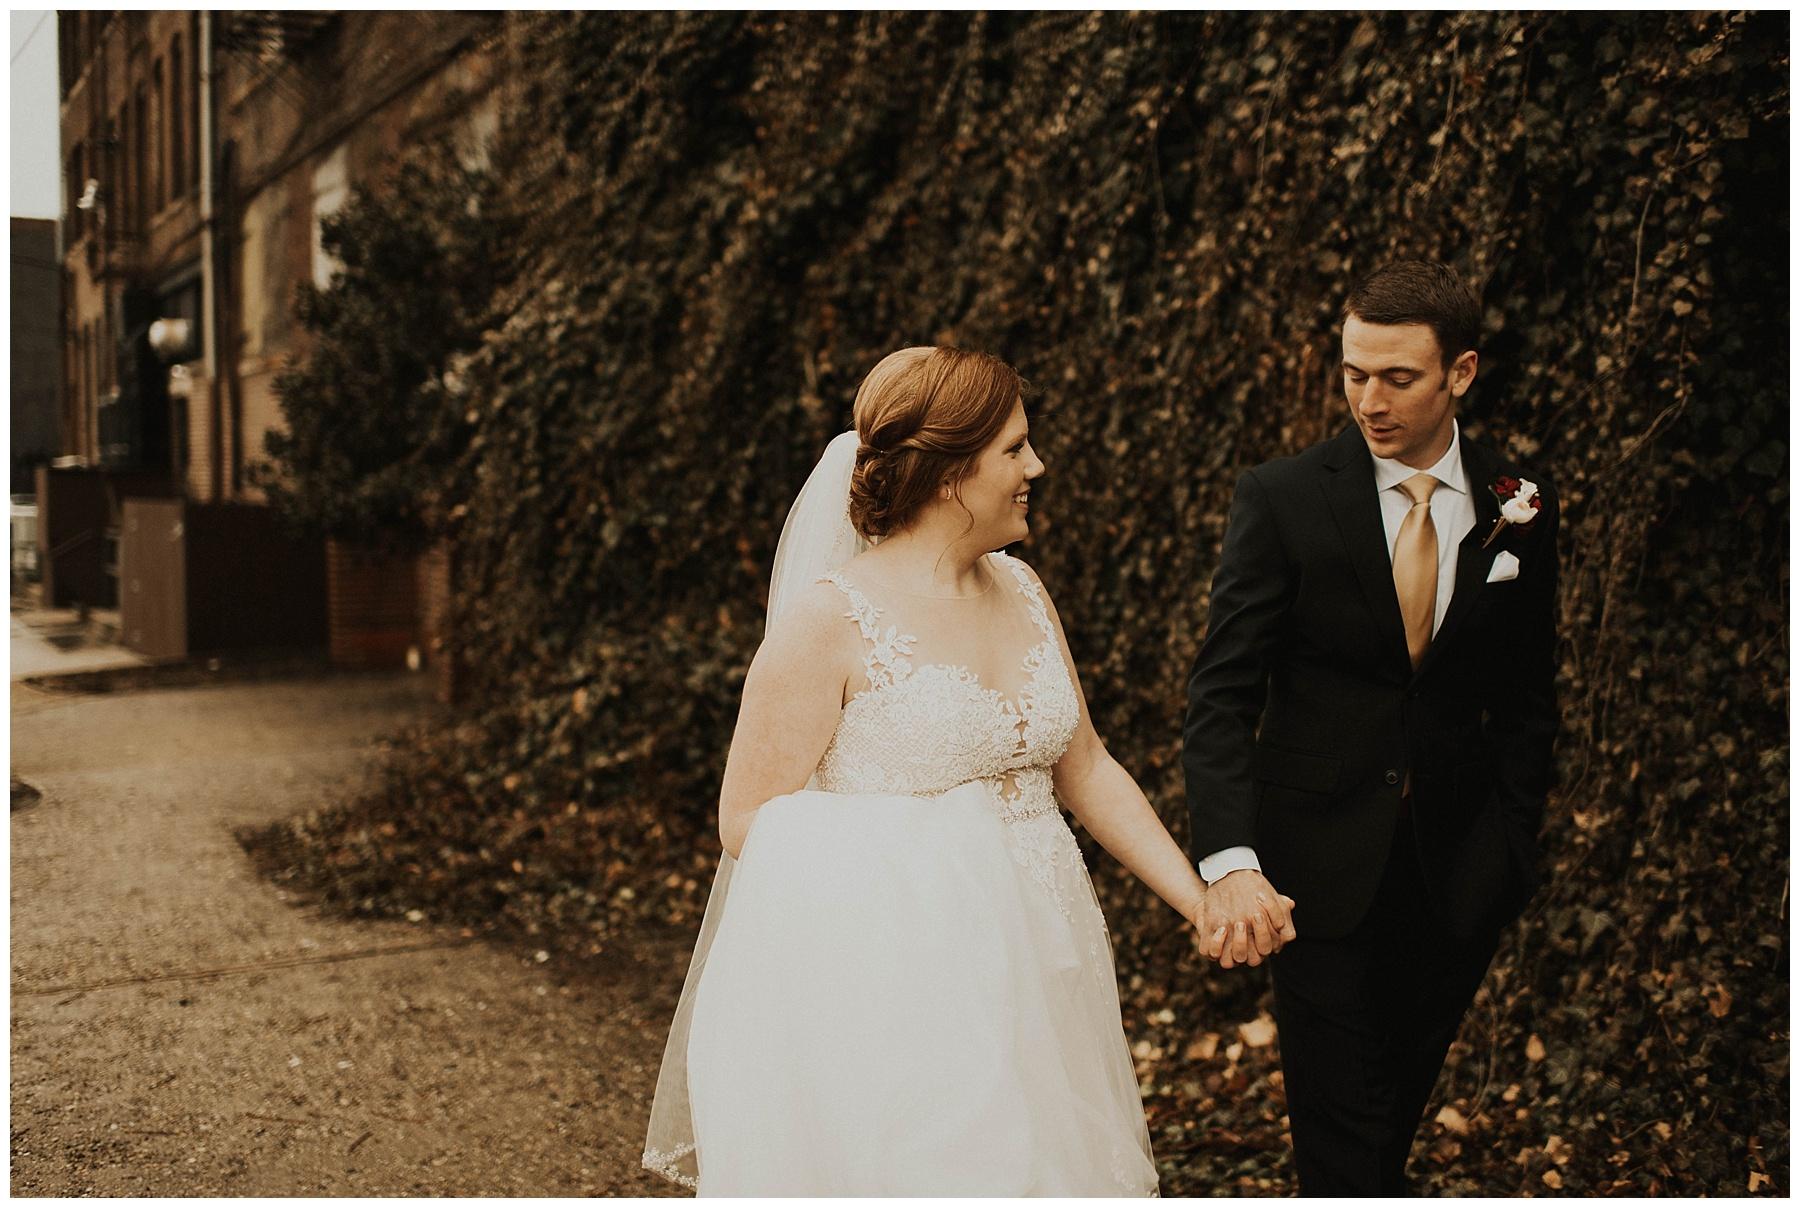 7e076b596c18 Johnny + Eliza // Classic Winter Wedding - Lauren F.otography | Central  Illinois Wedding Photographer, Chicago Wedding Photographer, Peoria IL  Wedding ...